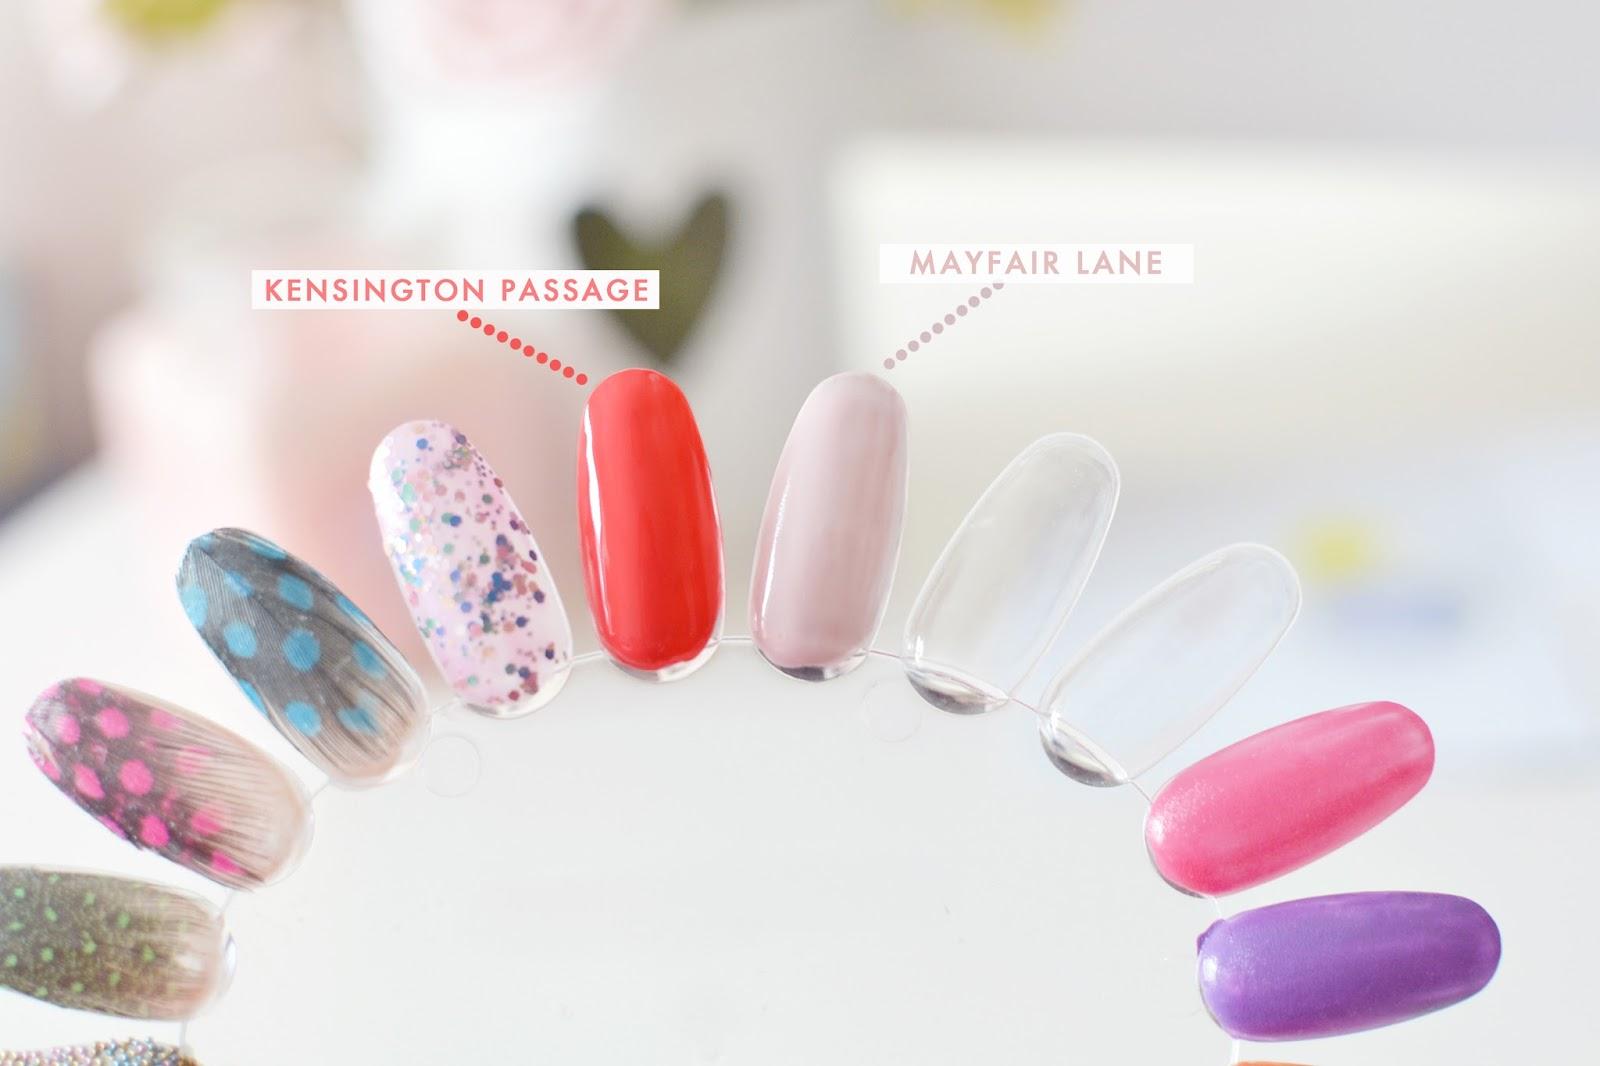 nails inc mayfair lane swatch, kensington passage swatch